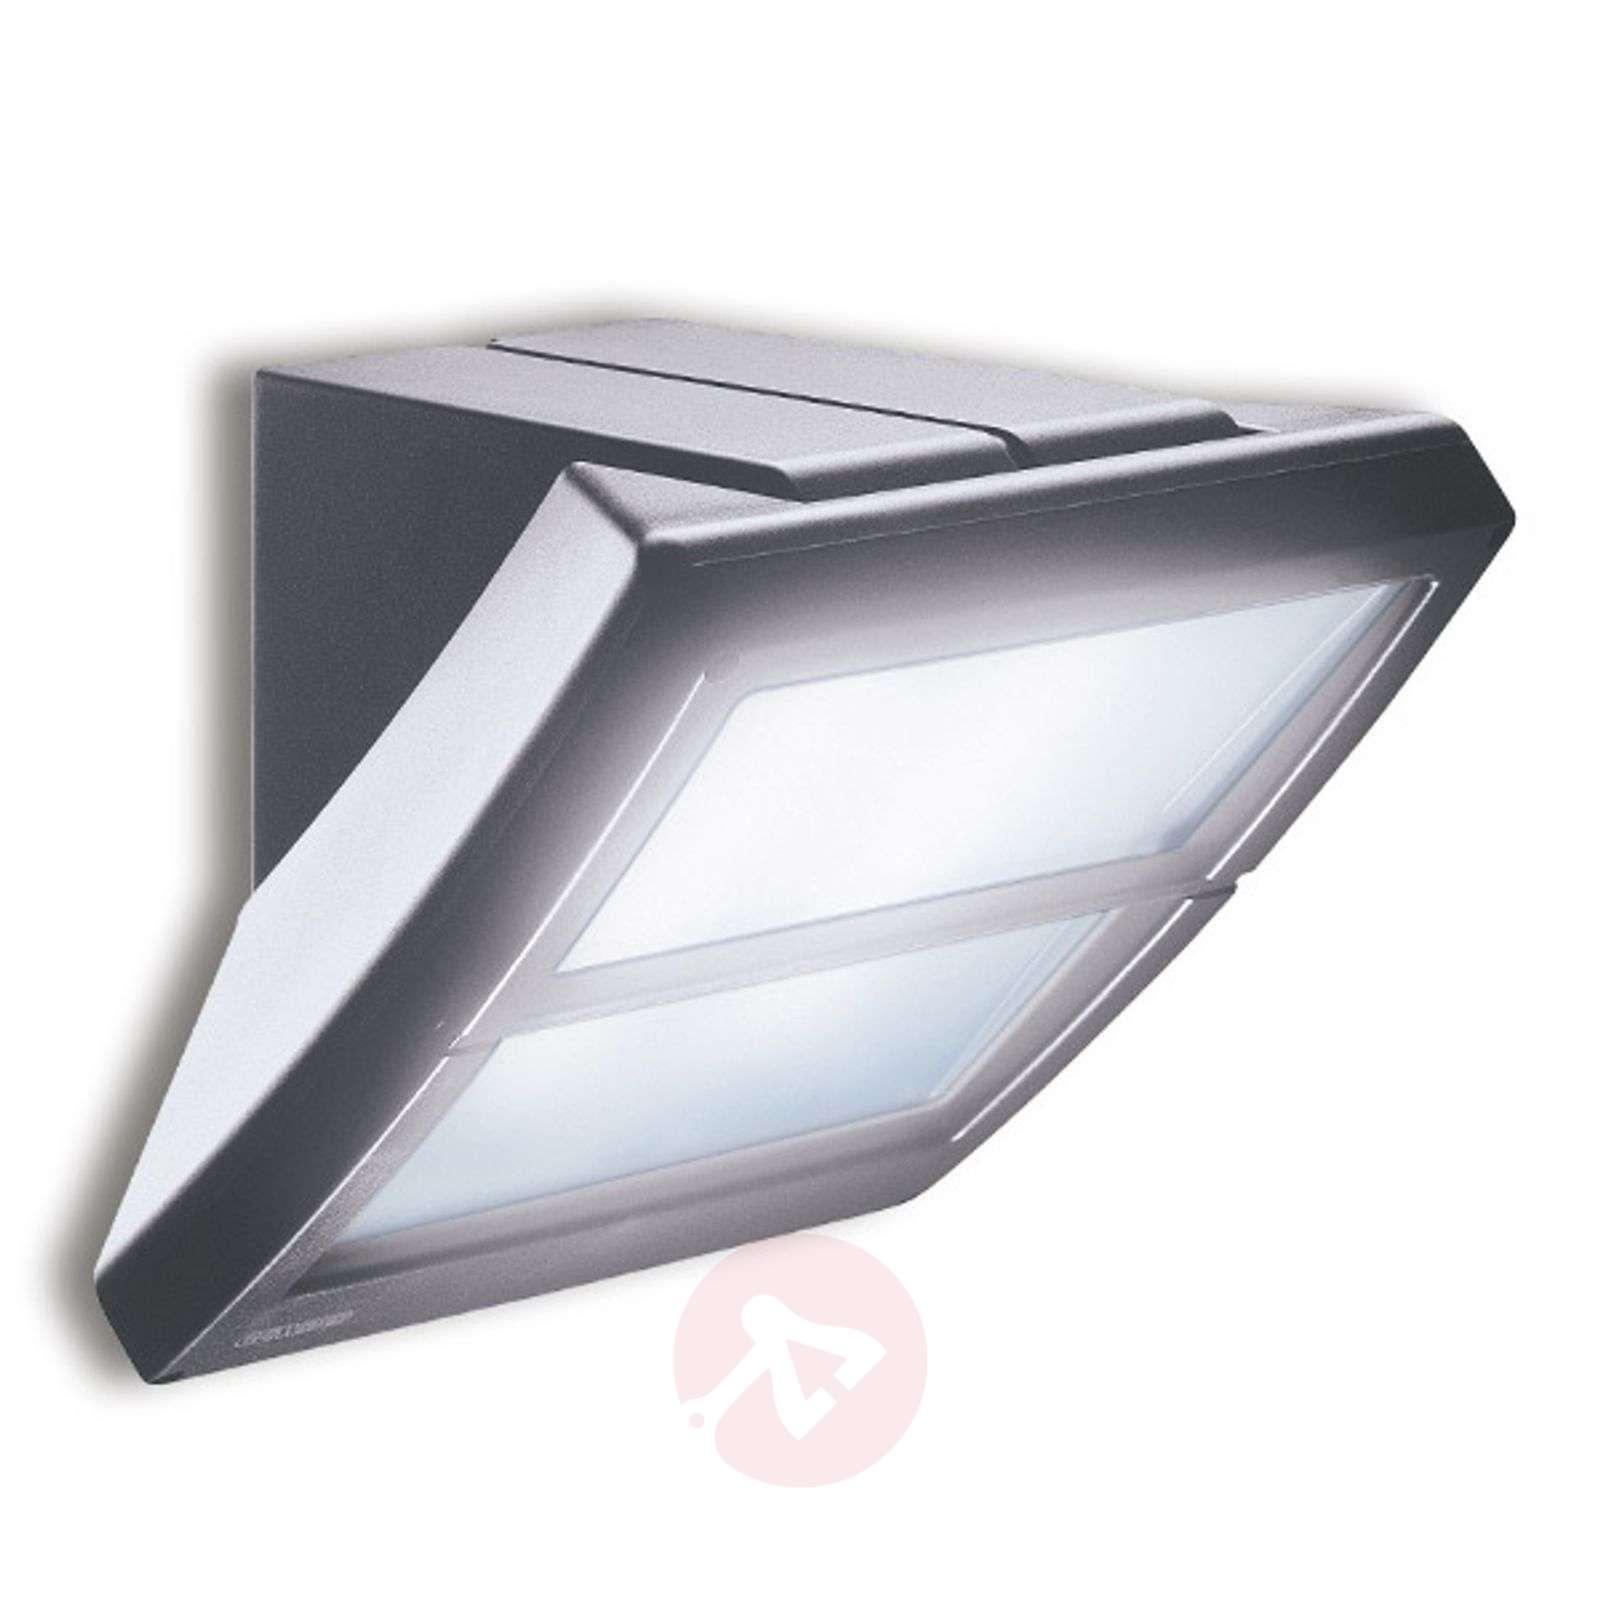 Versatile LED outdoor wall light Extro, 26 W-4003088-01